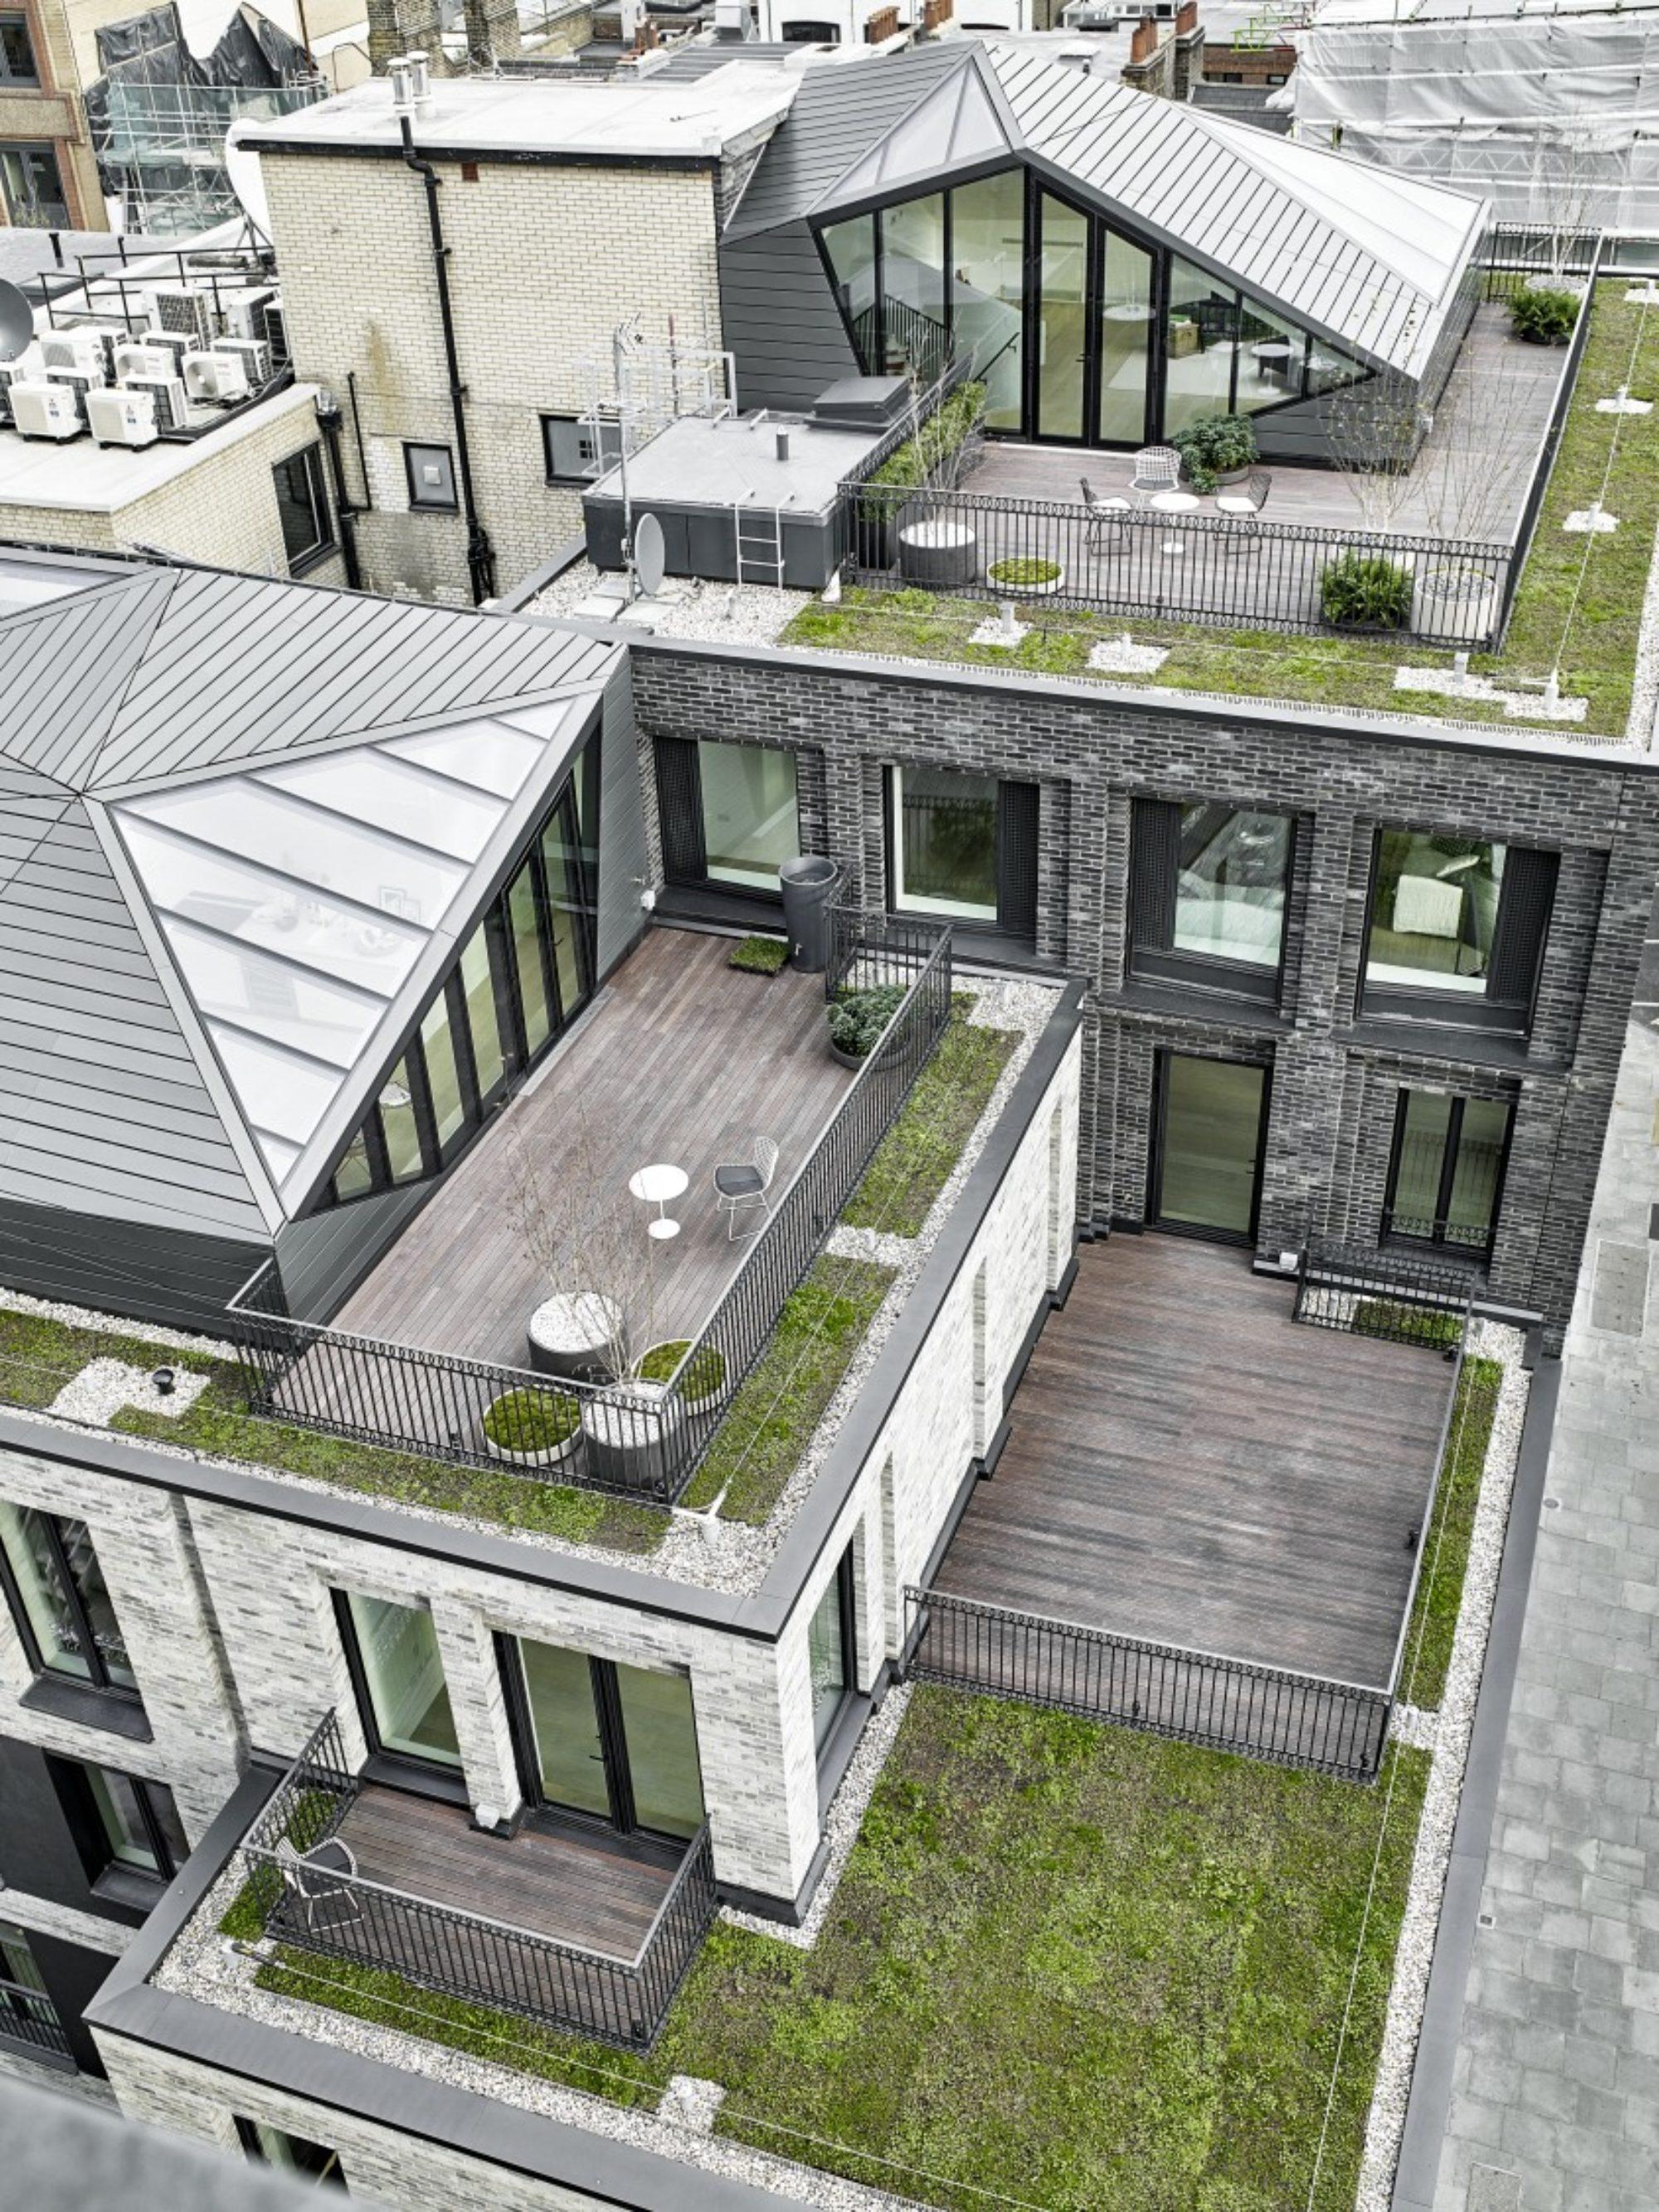 The Corner House wins NLA Housing award 2016